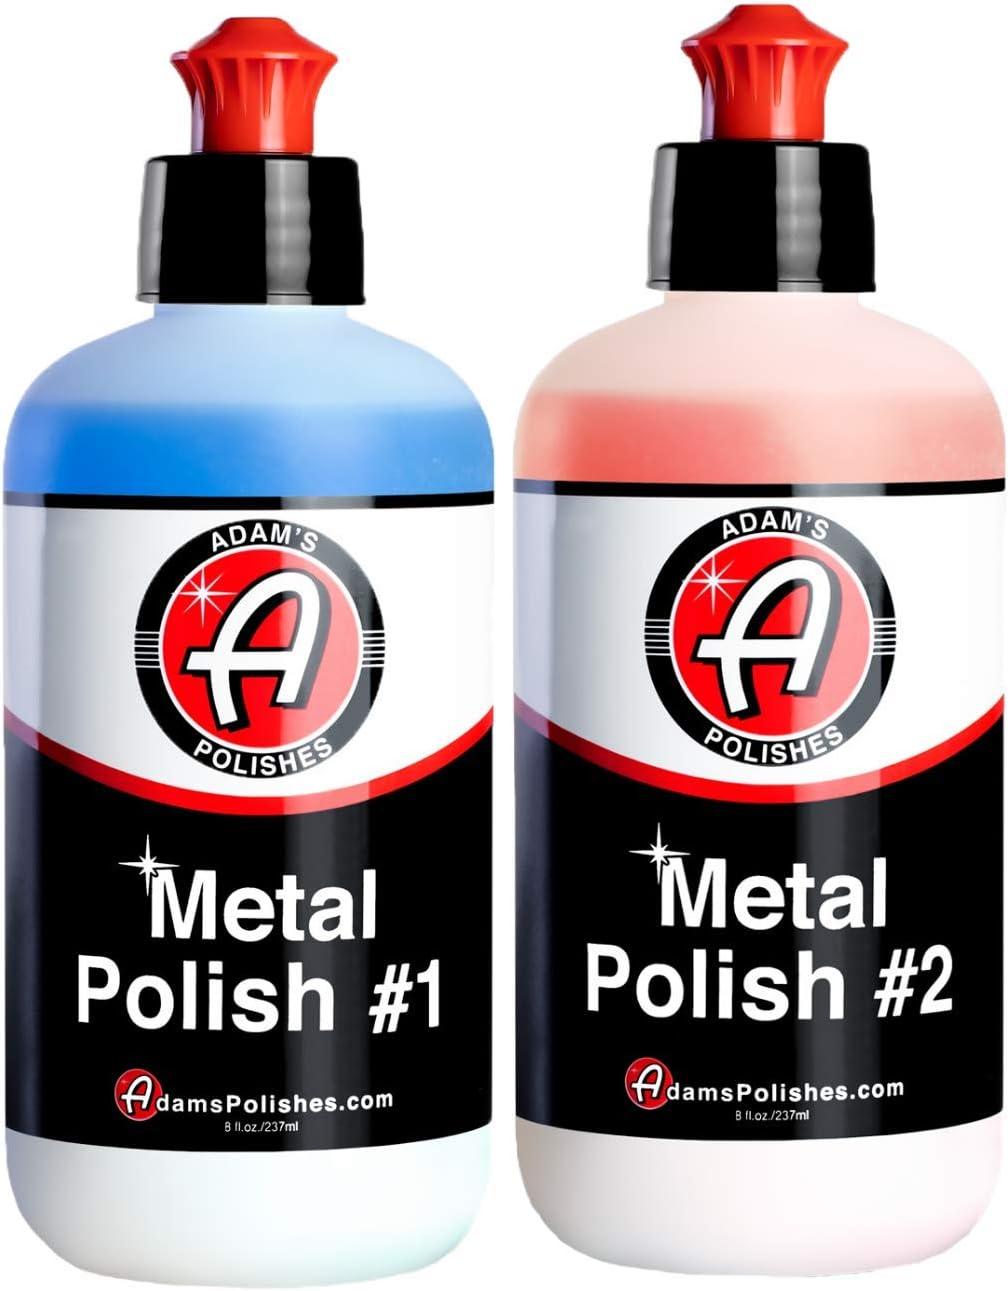 Adam's 2-stage Metal Polish